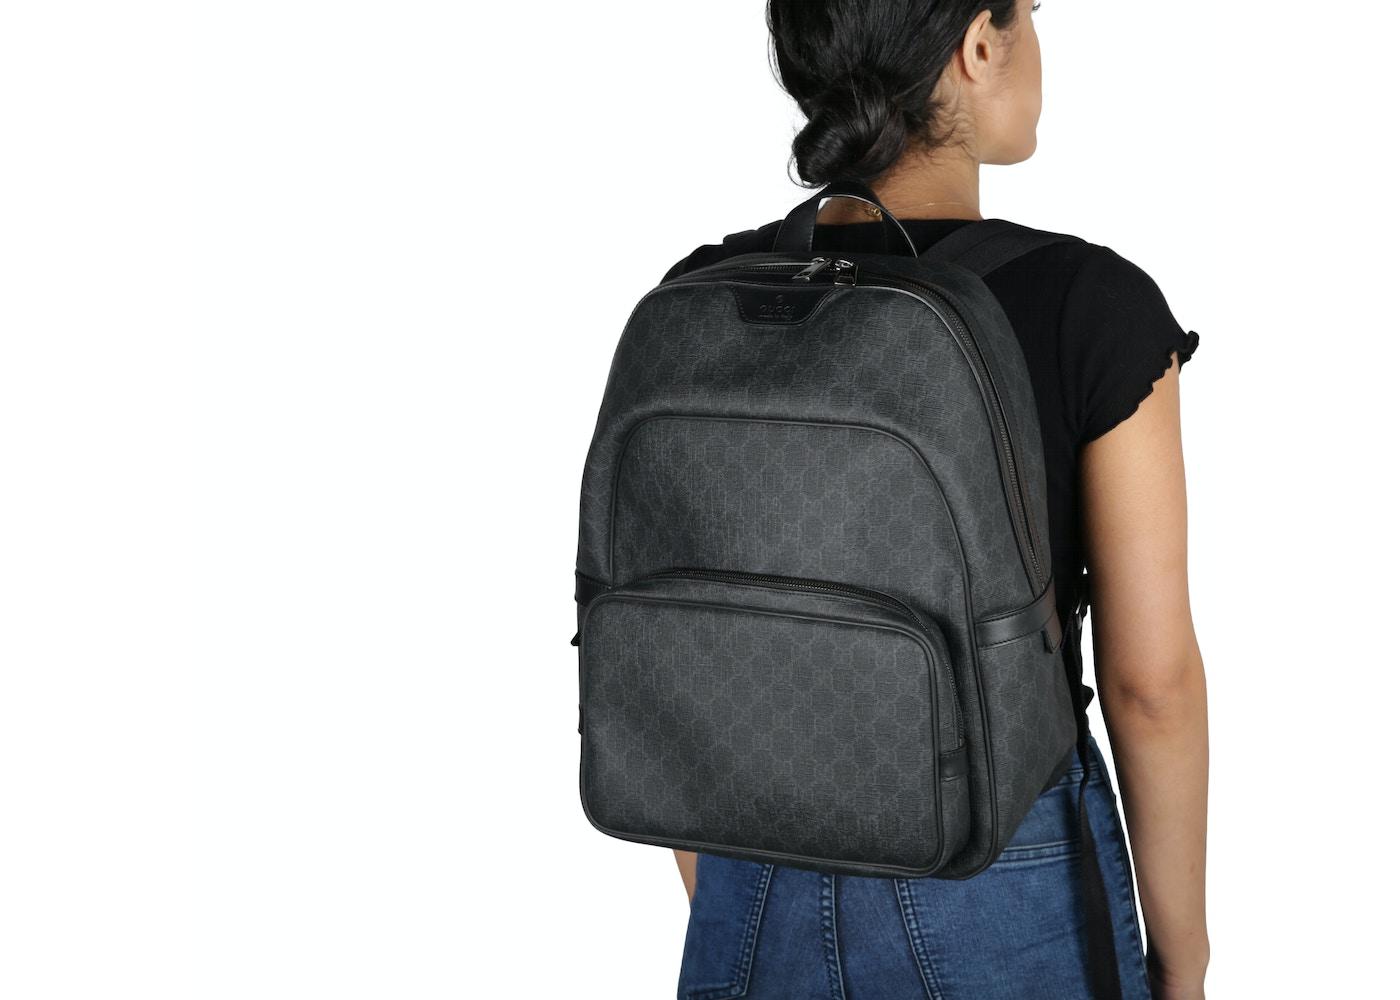 d0587f8ceca4 Gucci GG Supreme Backpack Monogram GG Medium Black